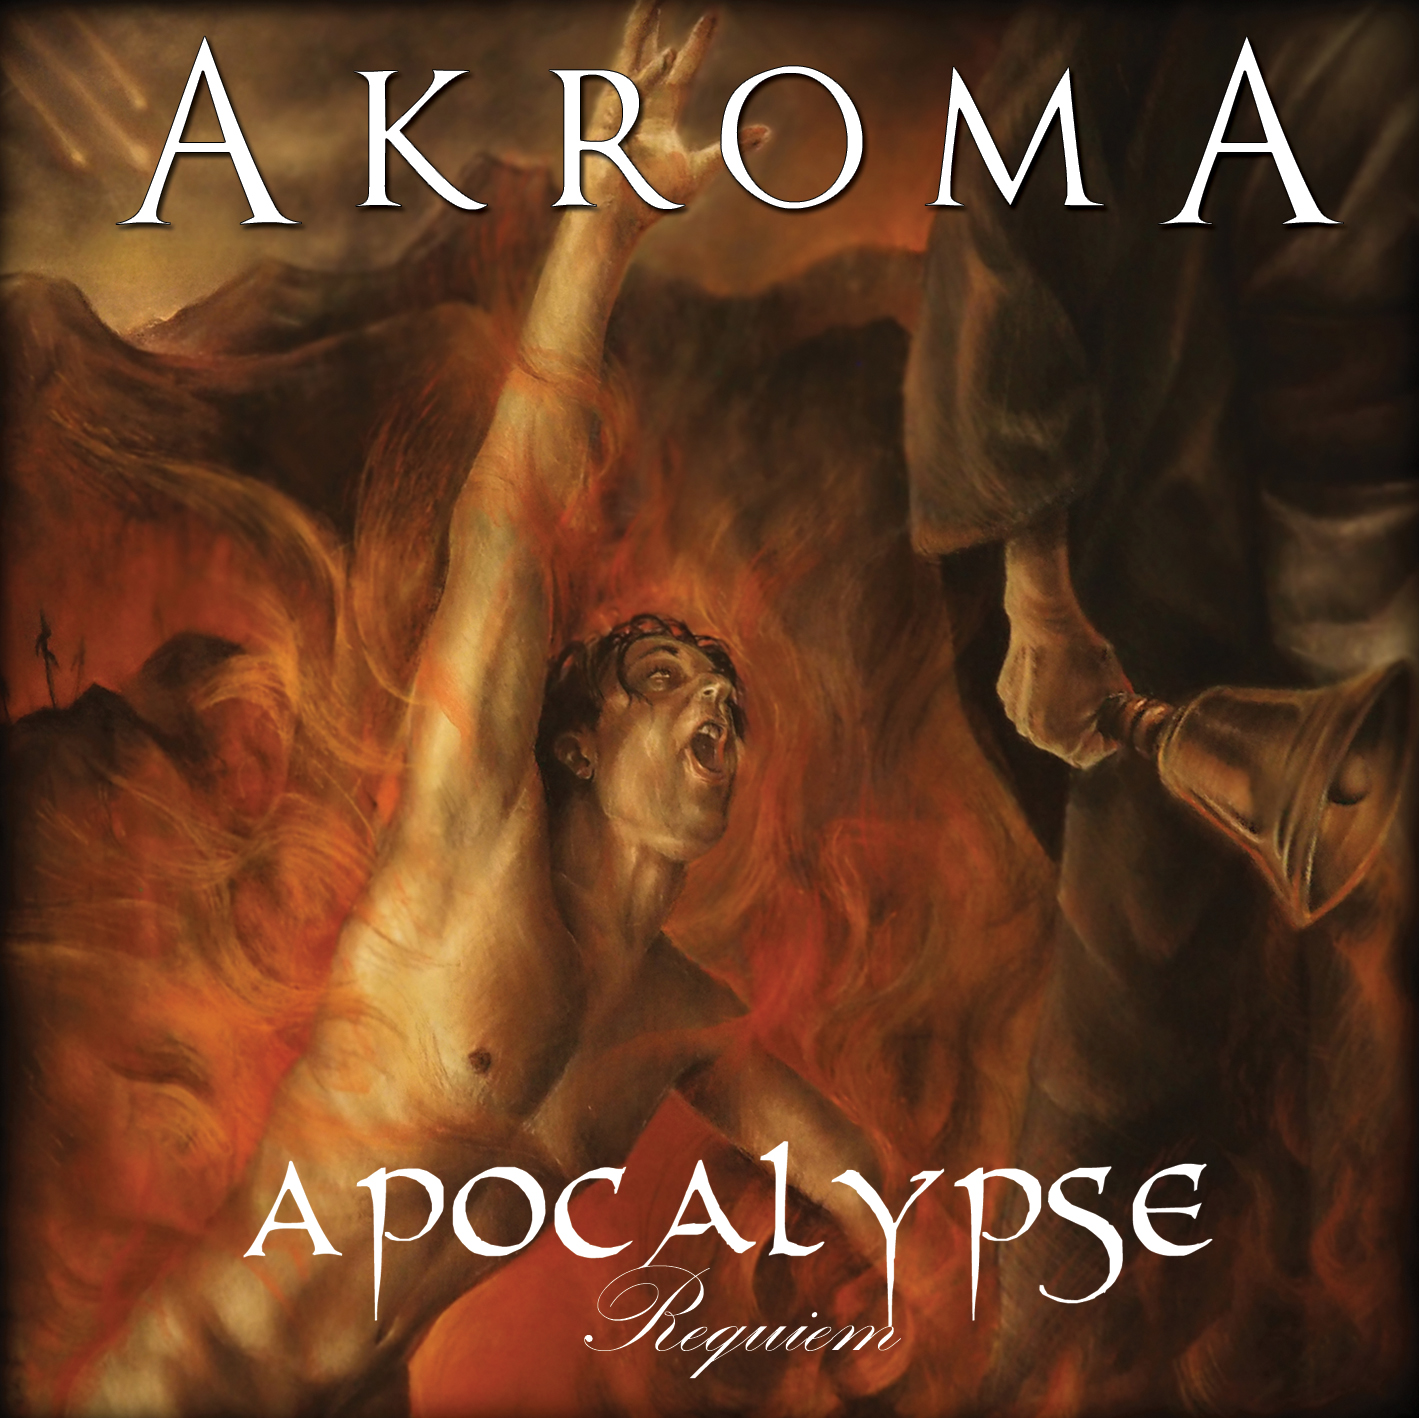 Akroma - Apocalypse Requiem